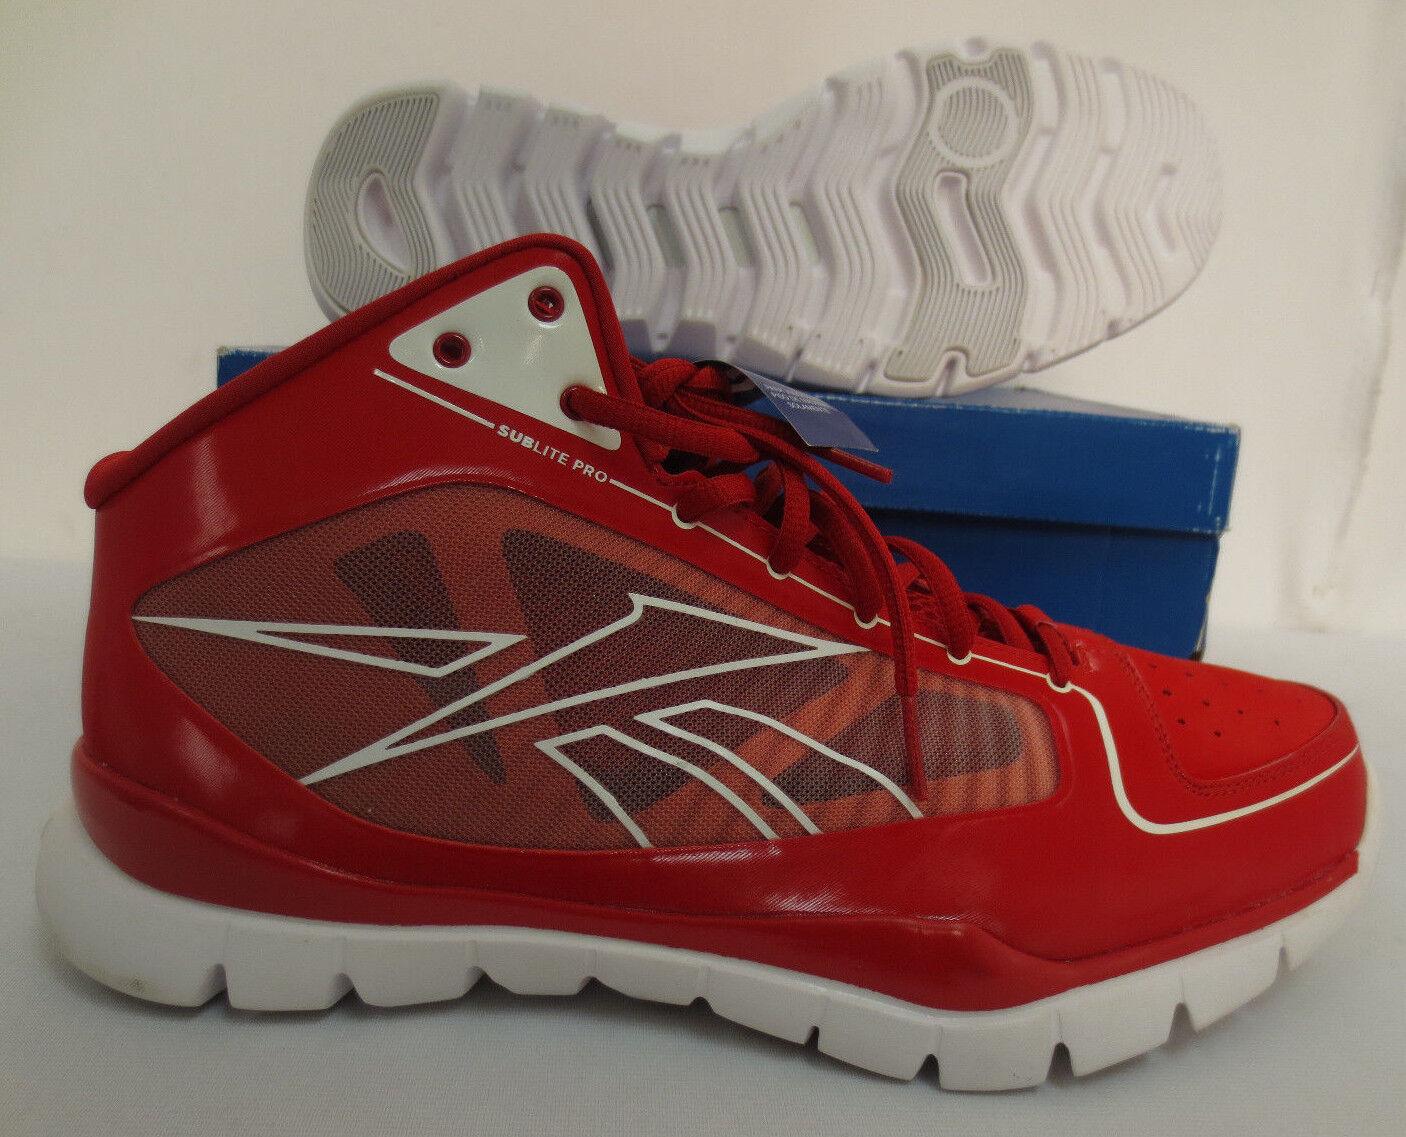 REEBOK SUBLITE RISE 10.5 GYM Schuhe J99829 RUNNING WORKOUT GYM 10.5 ROT WALKING NEW COOL 6e2ef9